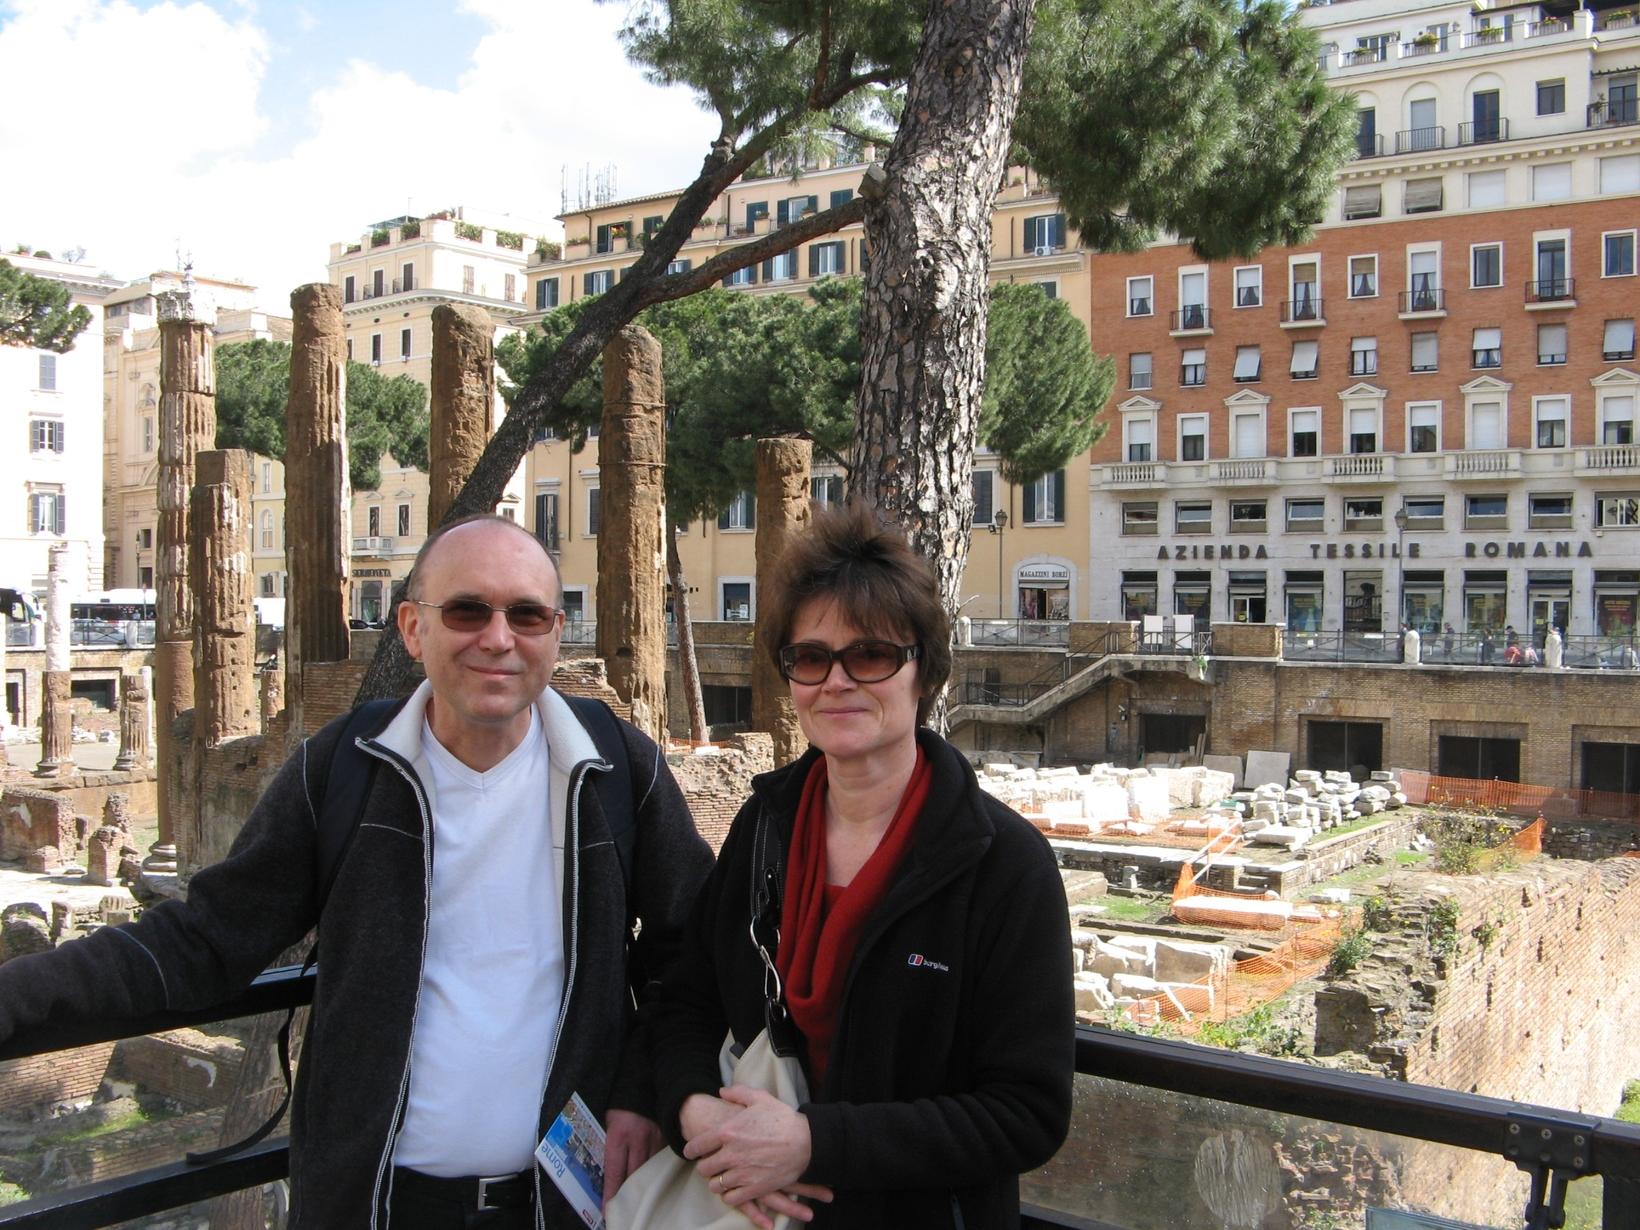 Mick & Deborah from Broughton Astley, United Kingdom